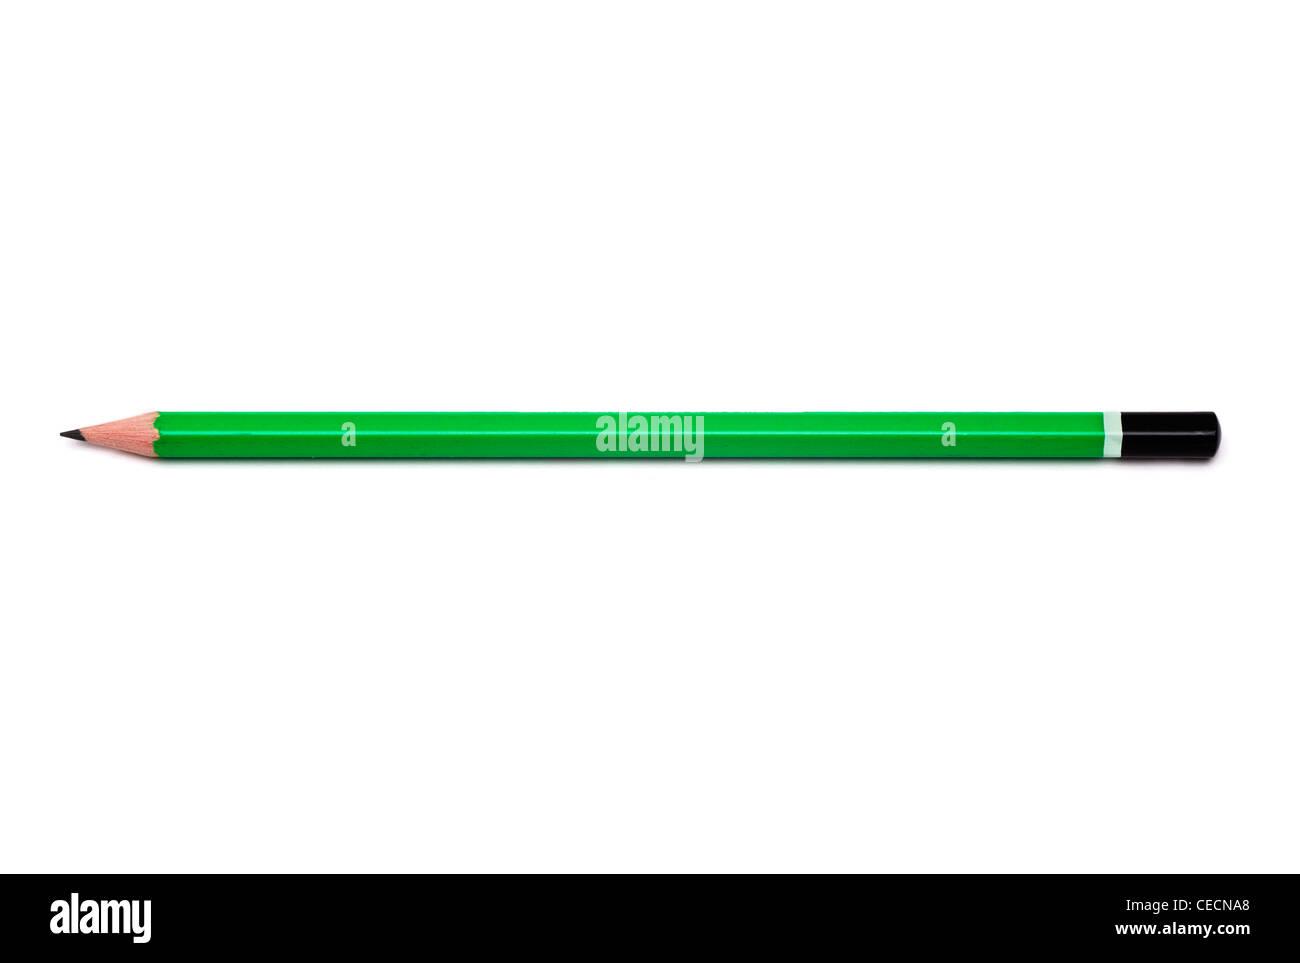 Pencil on white background - Stock Image